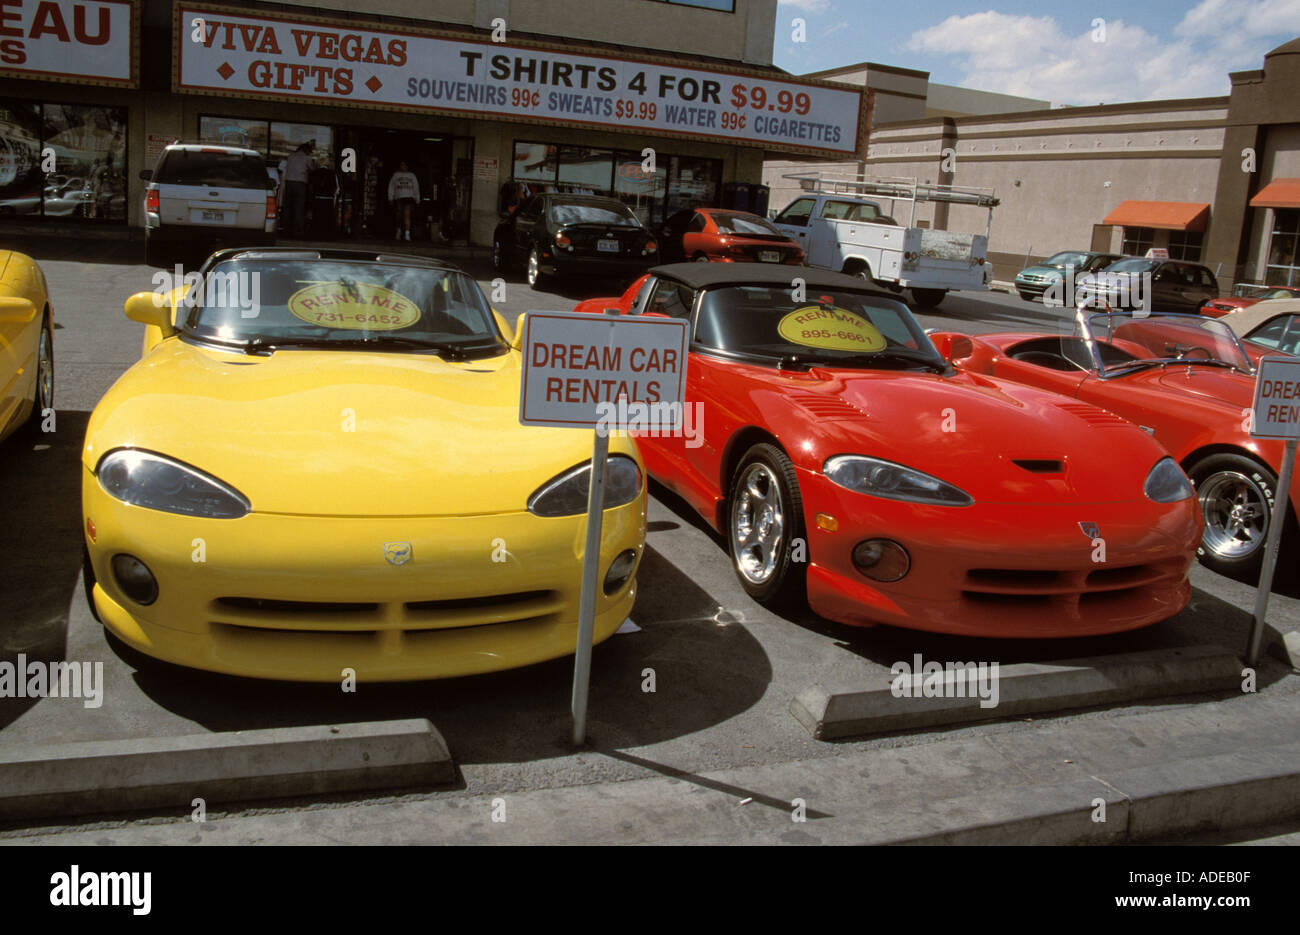 Las Vegas Dodge >> Las Vegas Nevada Usa Dodge Viper Car Automobile Supercar